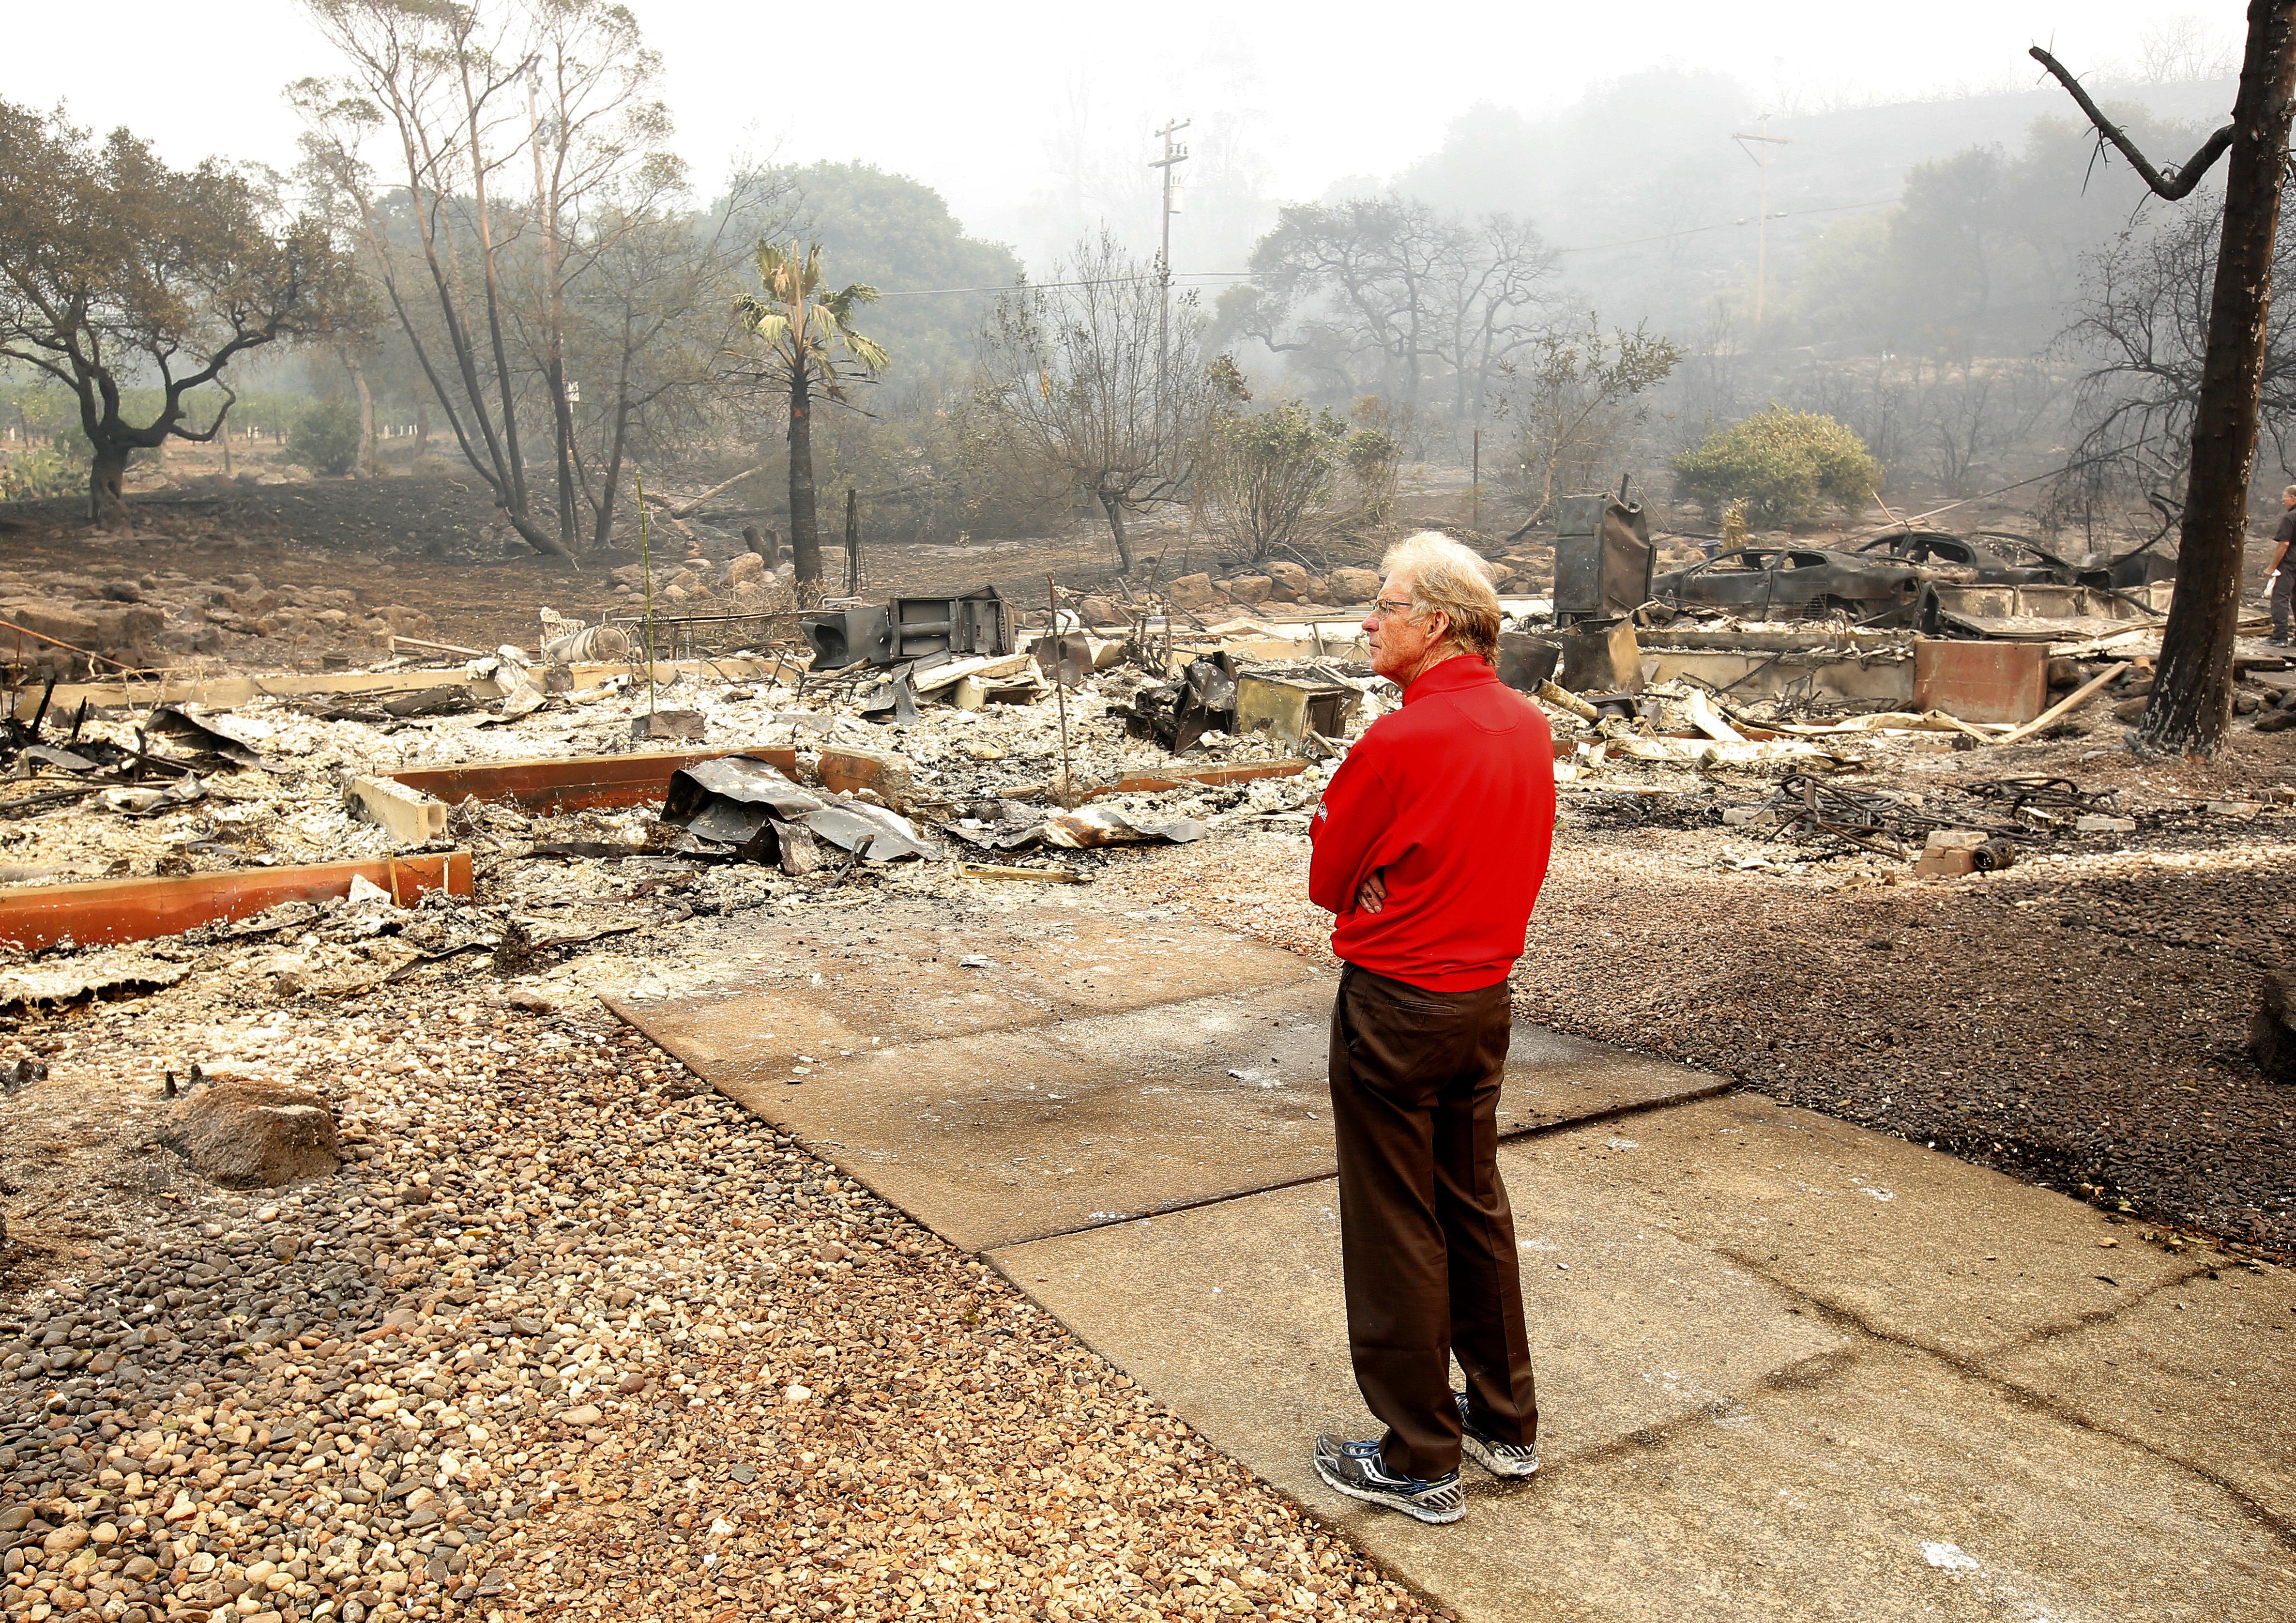 Mike Rippey看著爸媽的家已成灰燼, 他100歲的爸爸Charles Rippey和98歲的媽媽 Sara,在納帕這場大火中,因無法逃離而與家園同歸於「燼」。(美聯社)